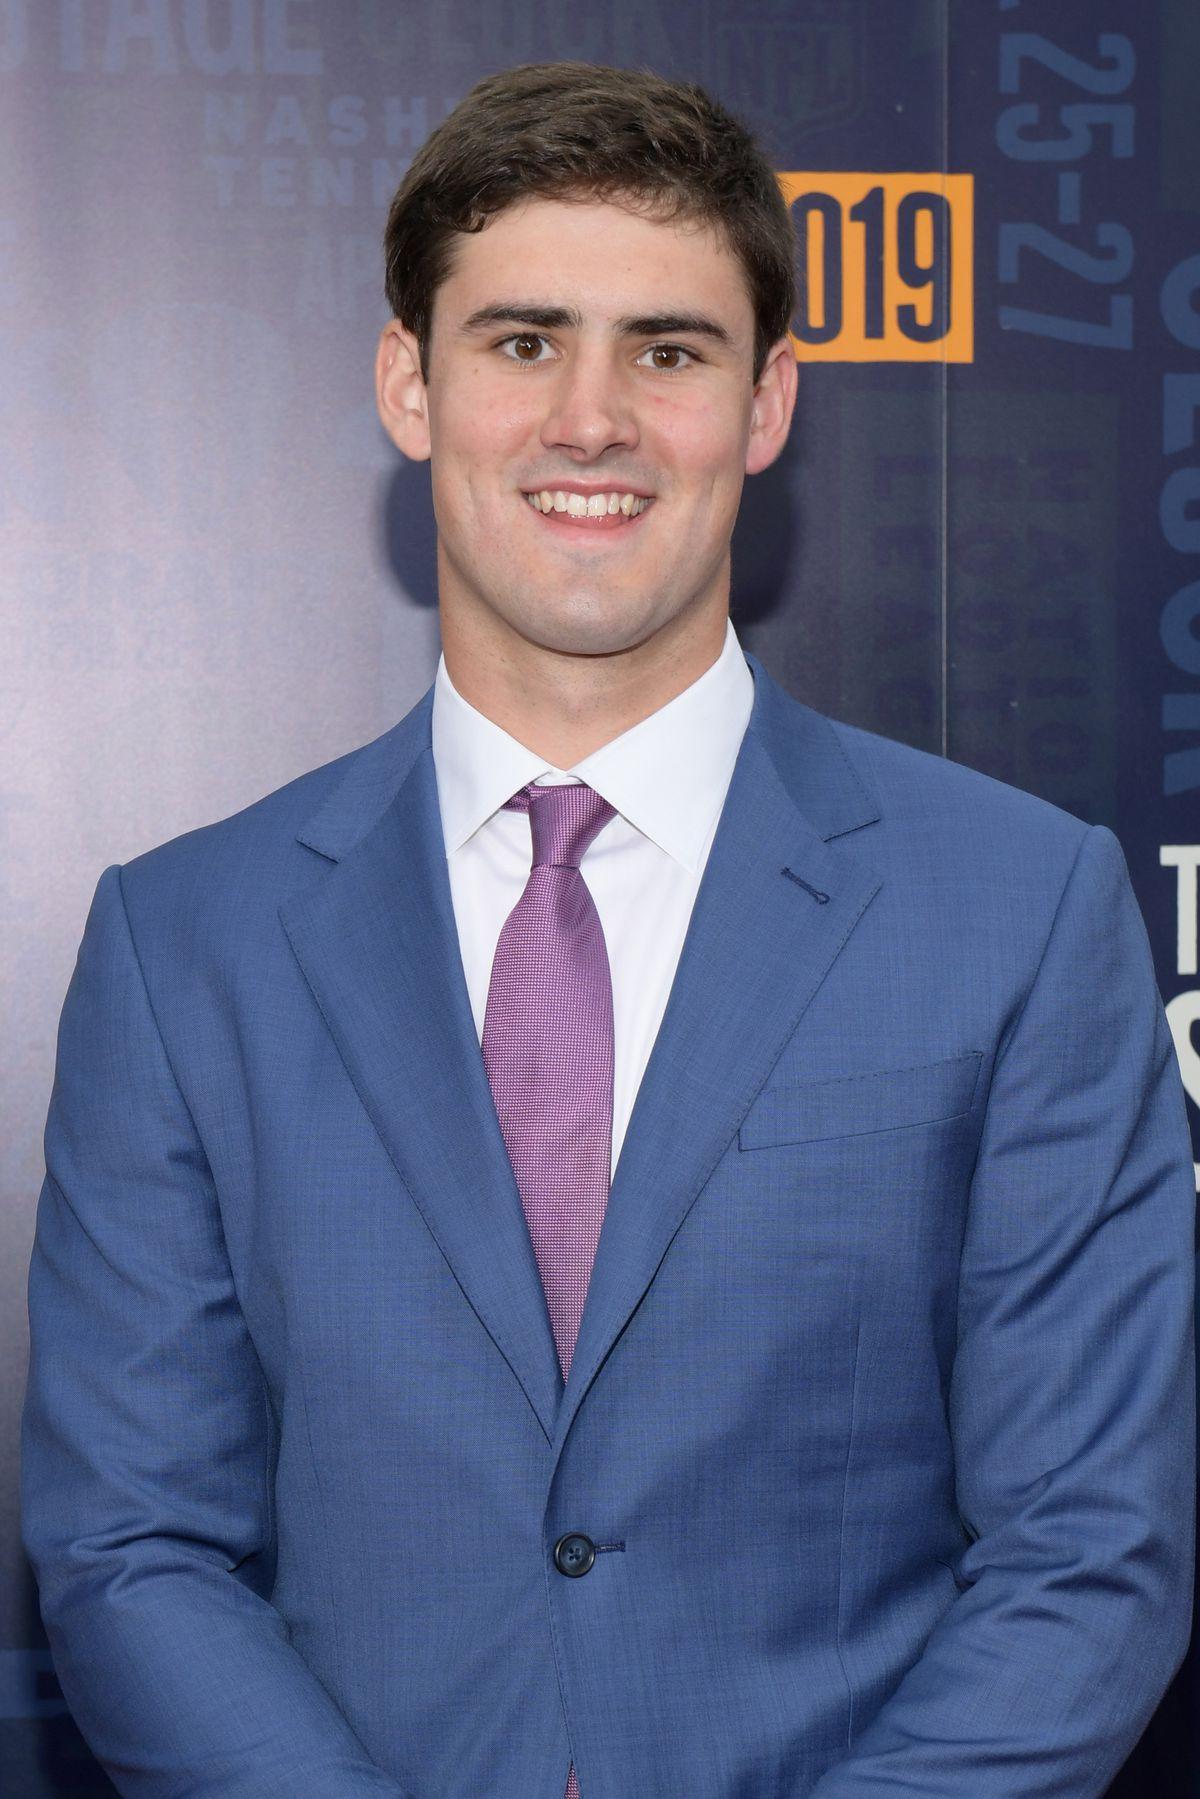 2019 NFL Draft - Red Carpet